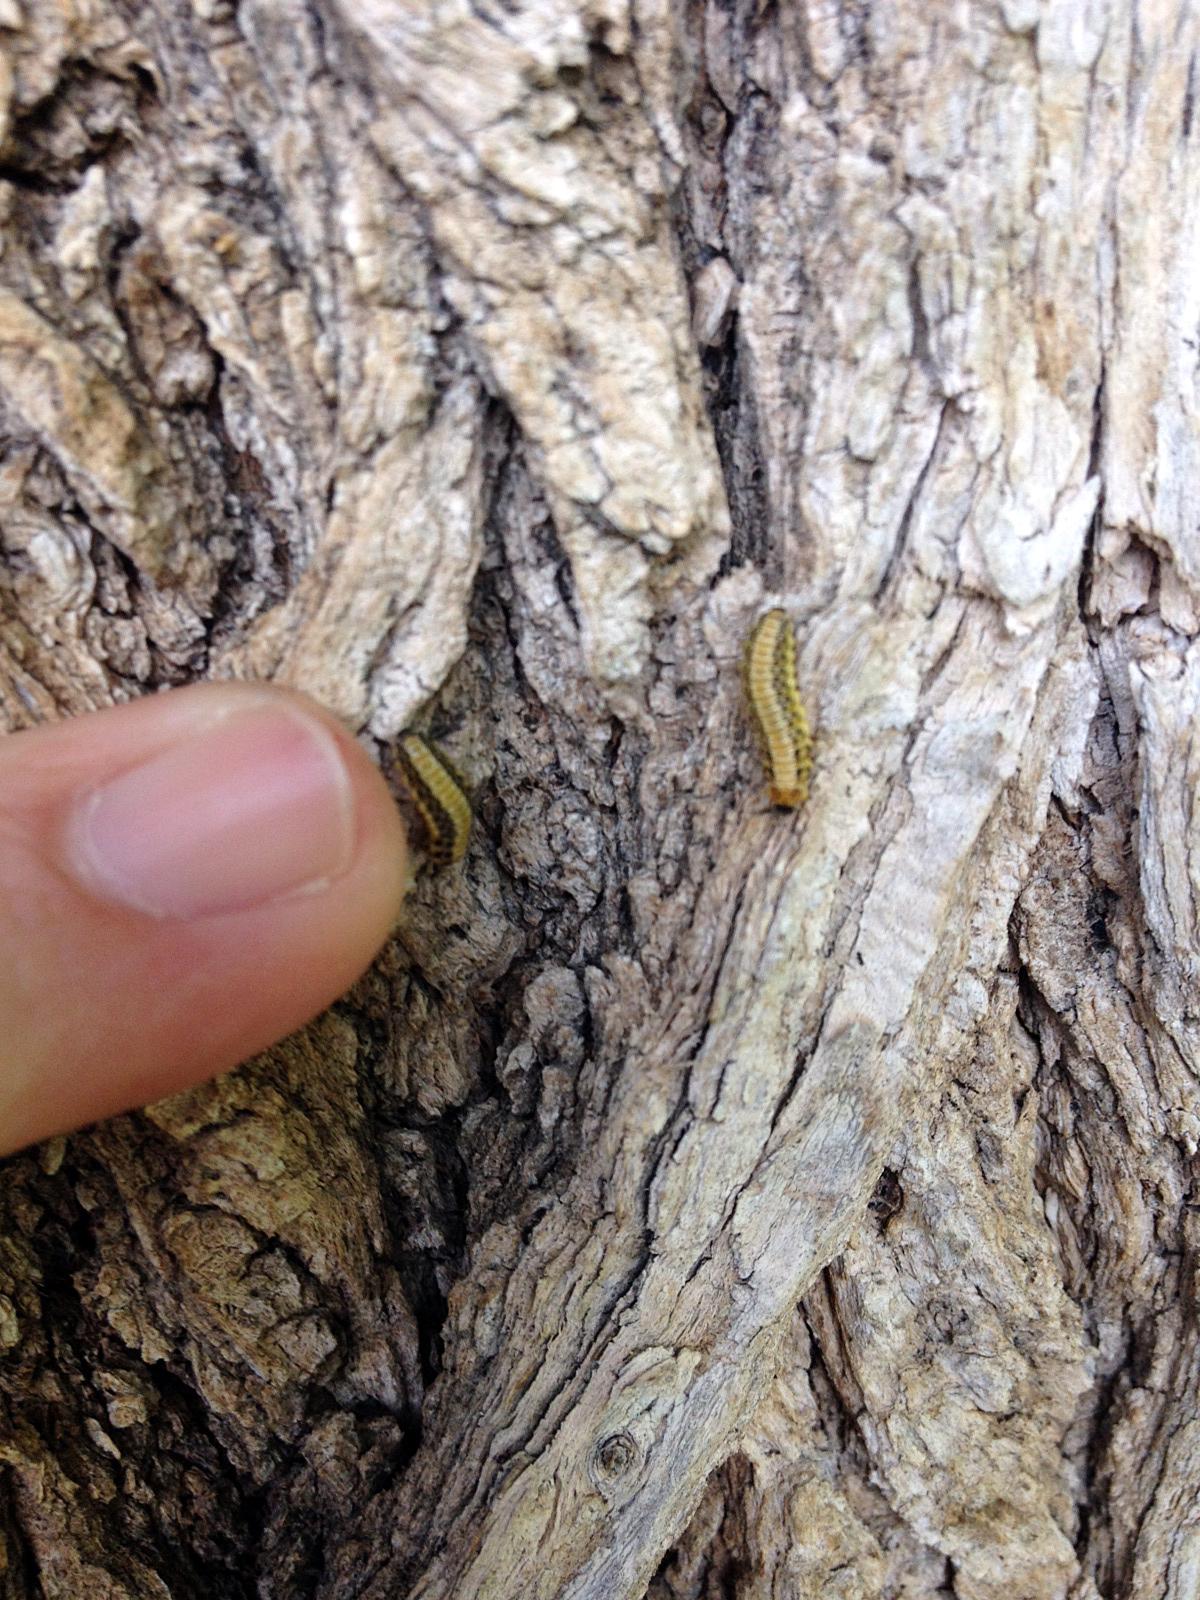 BeetleLarvae